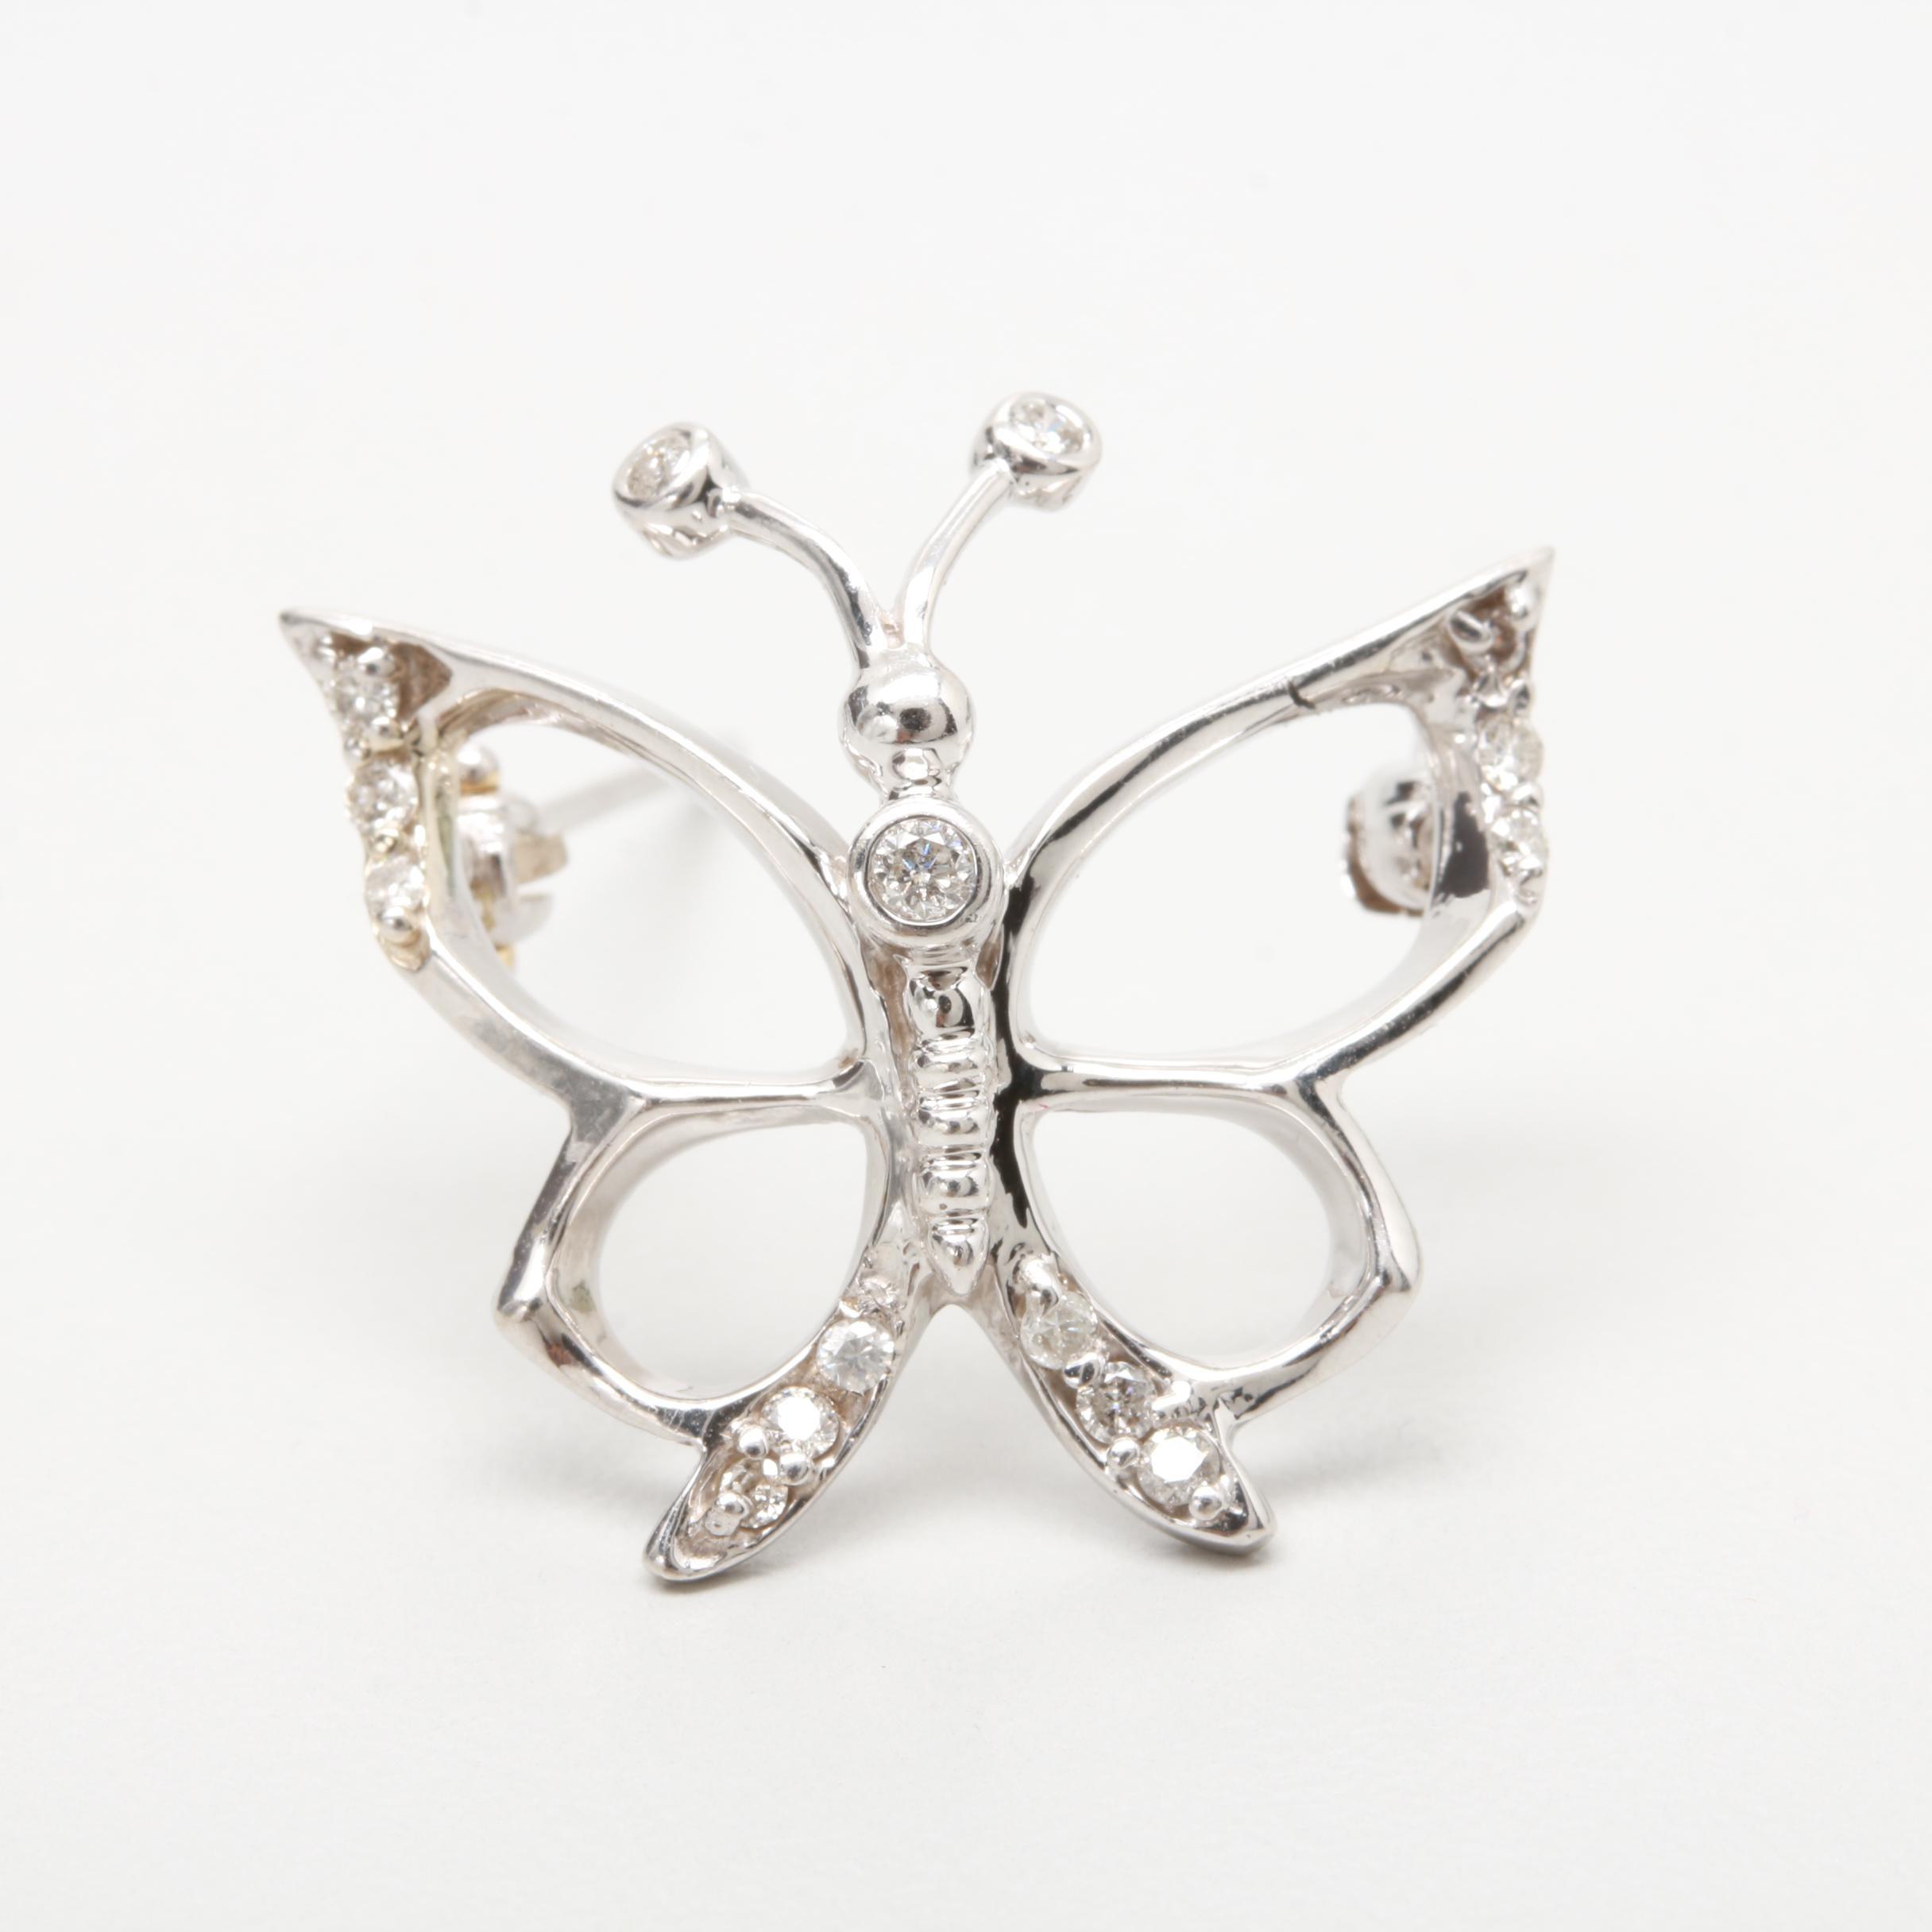 14K White Gold Diamond Butterfly Brooch